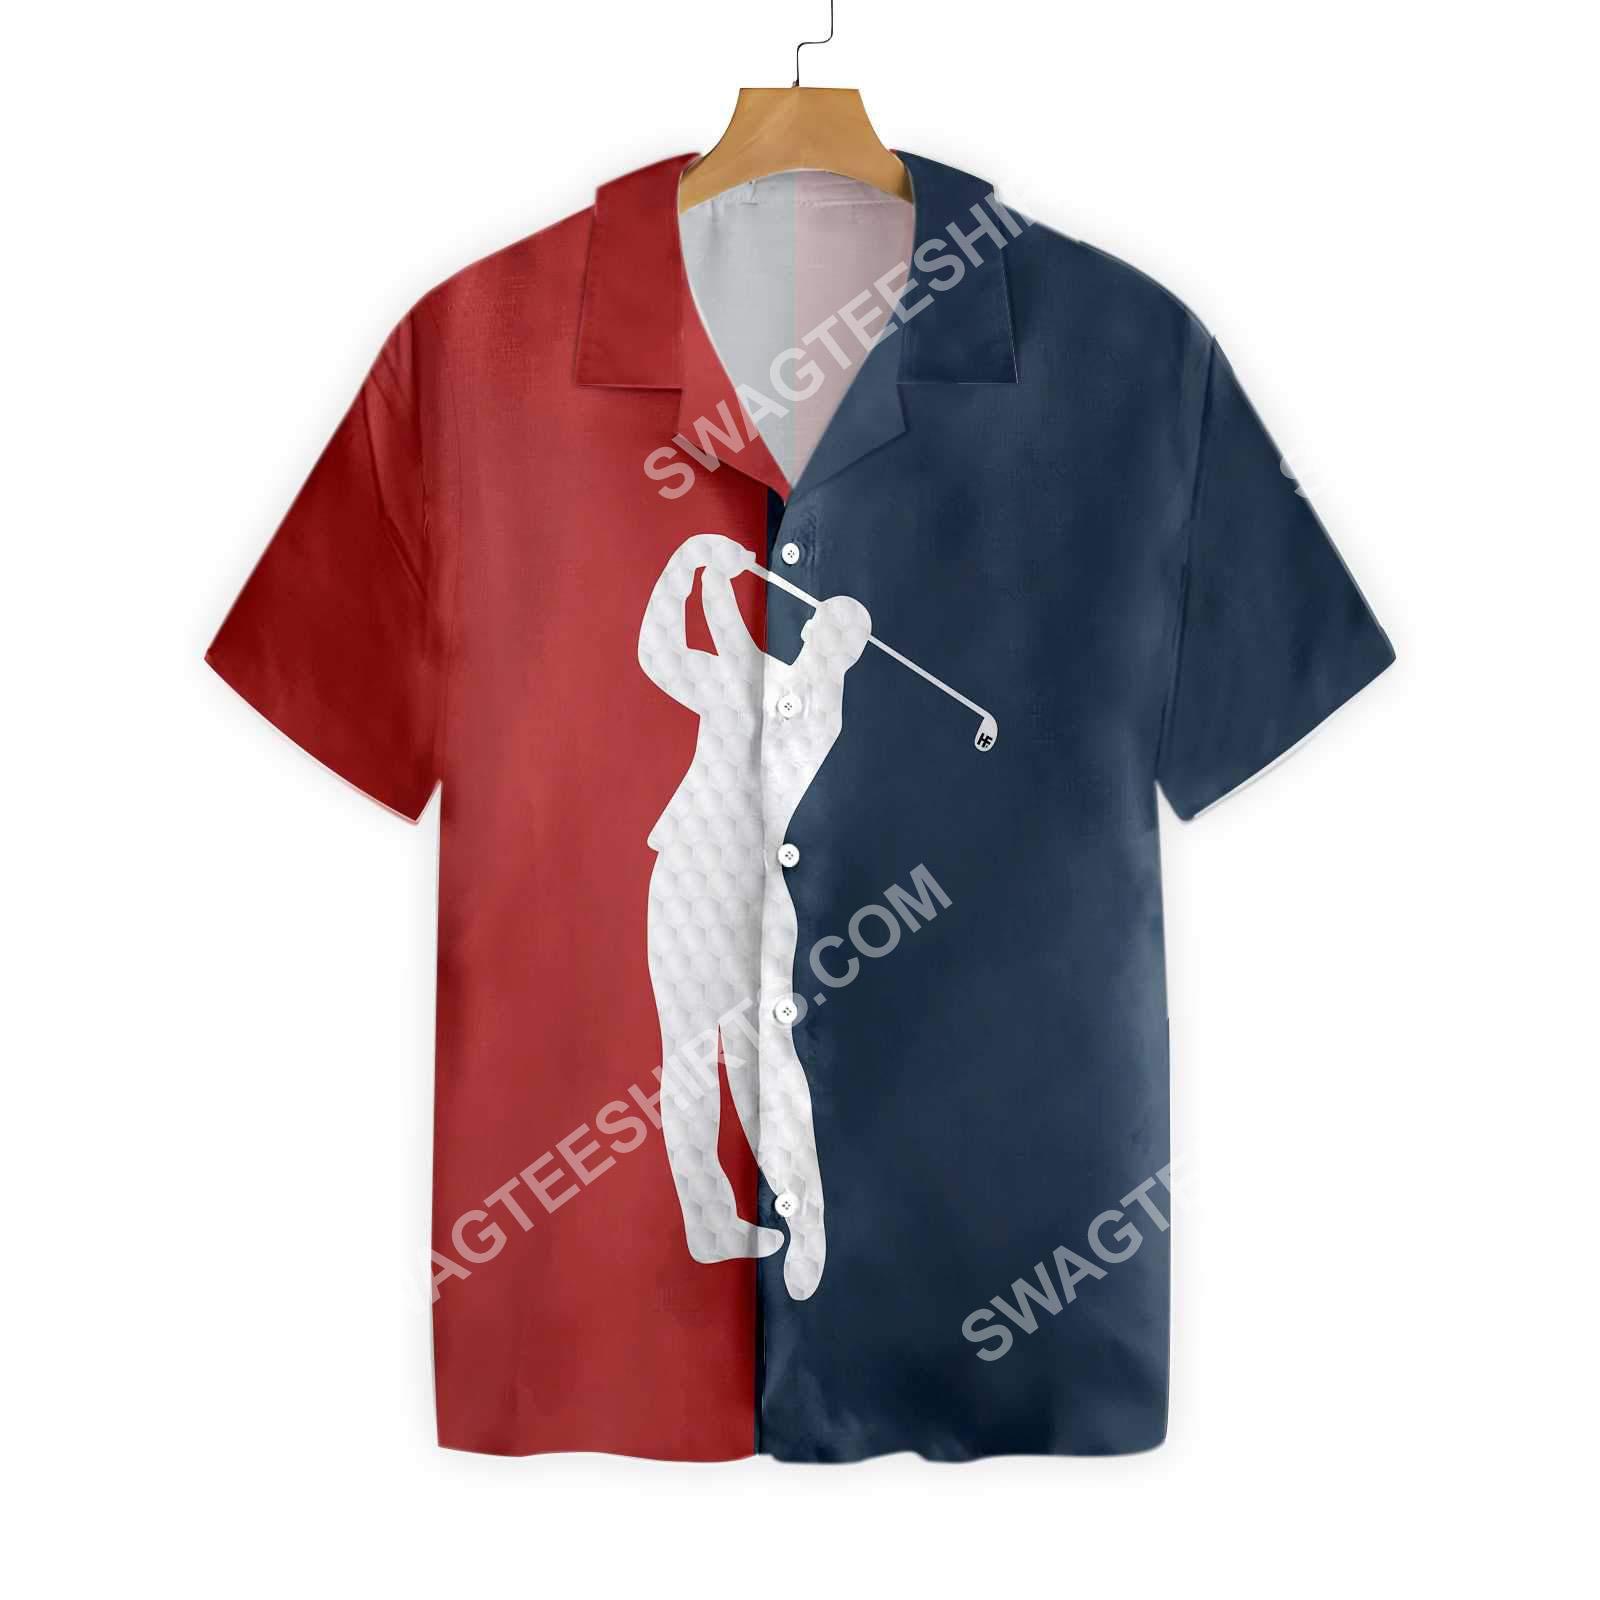 vintage golf lover all over printed hawaiian shirt 5(1)